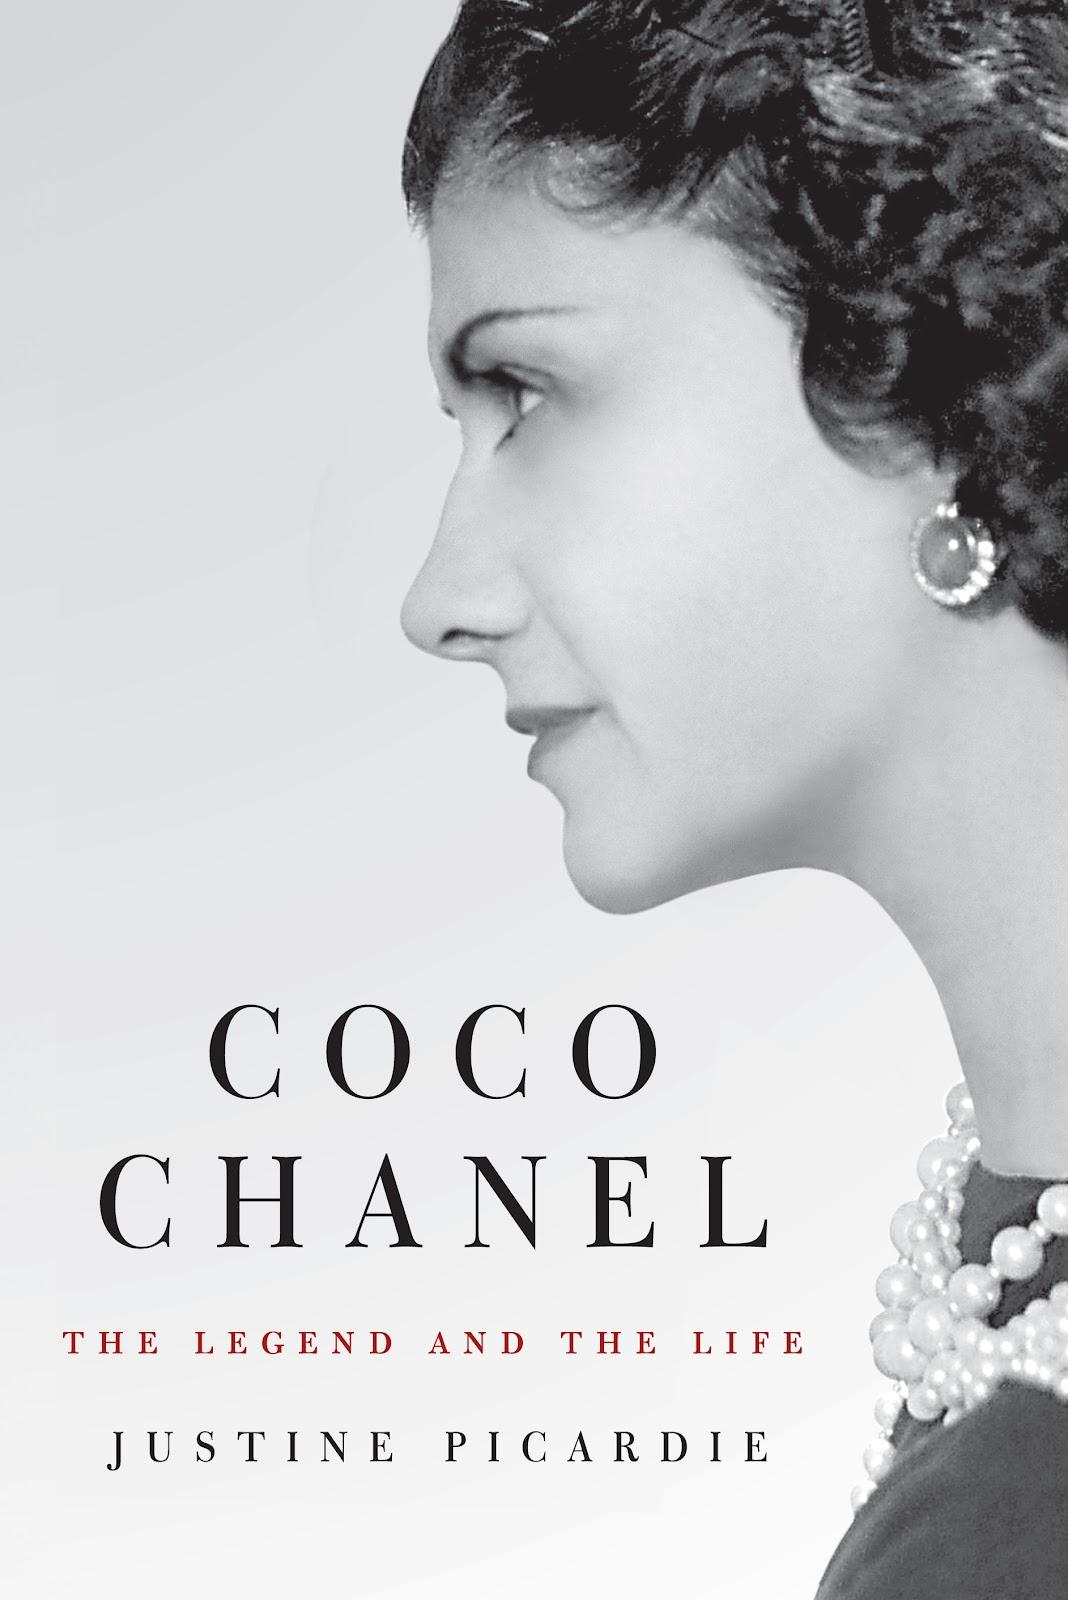 http://3.bp.blogspot.com/-ym2iFO8b2NM/UDFUVLP3fSI/AAAAAAAADR8/S25fQpVYtXU/s1600/04_Coco_Chanel_Book_Cover.jpg